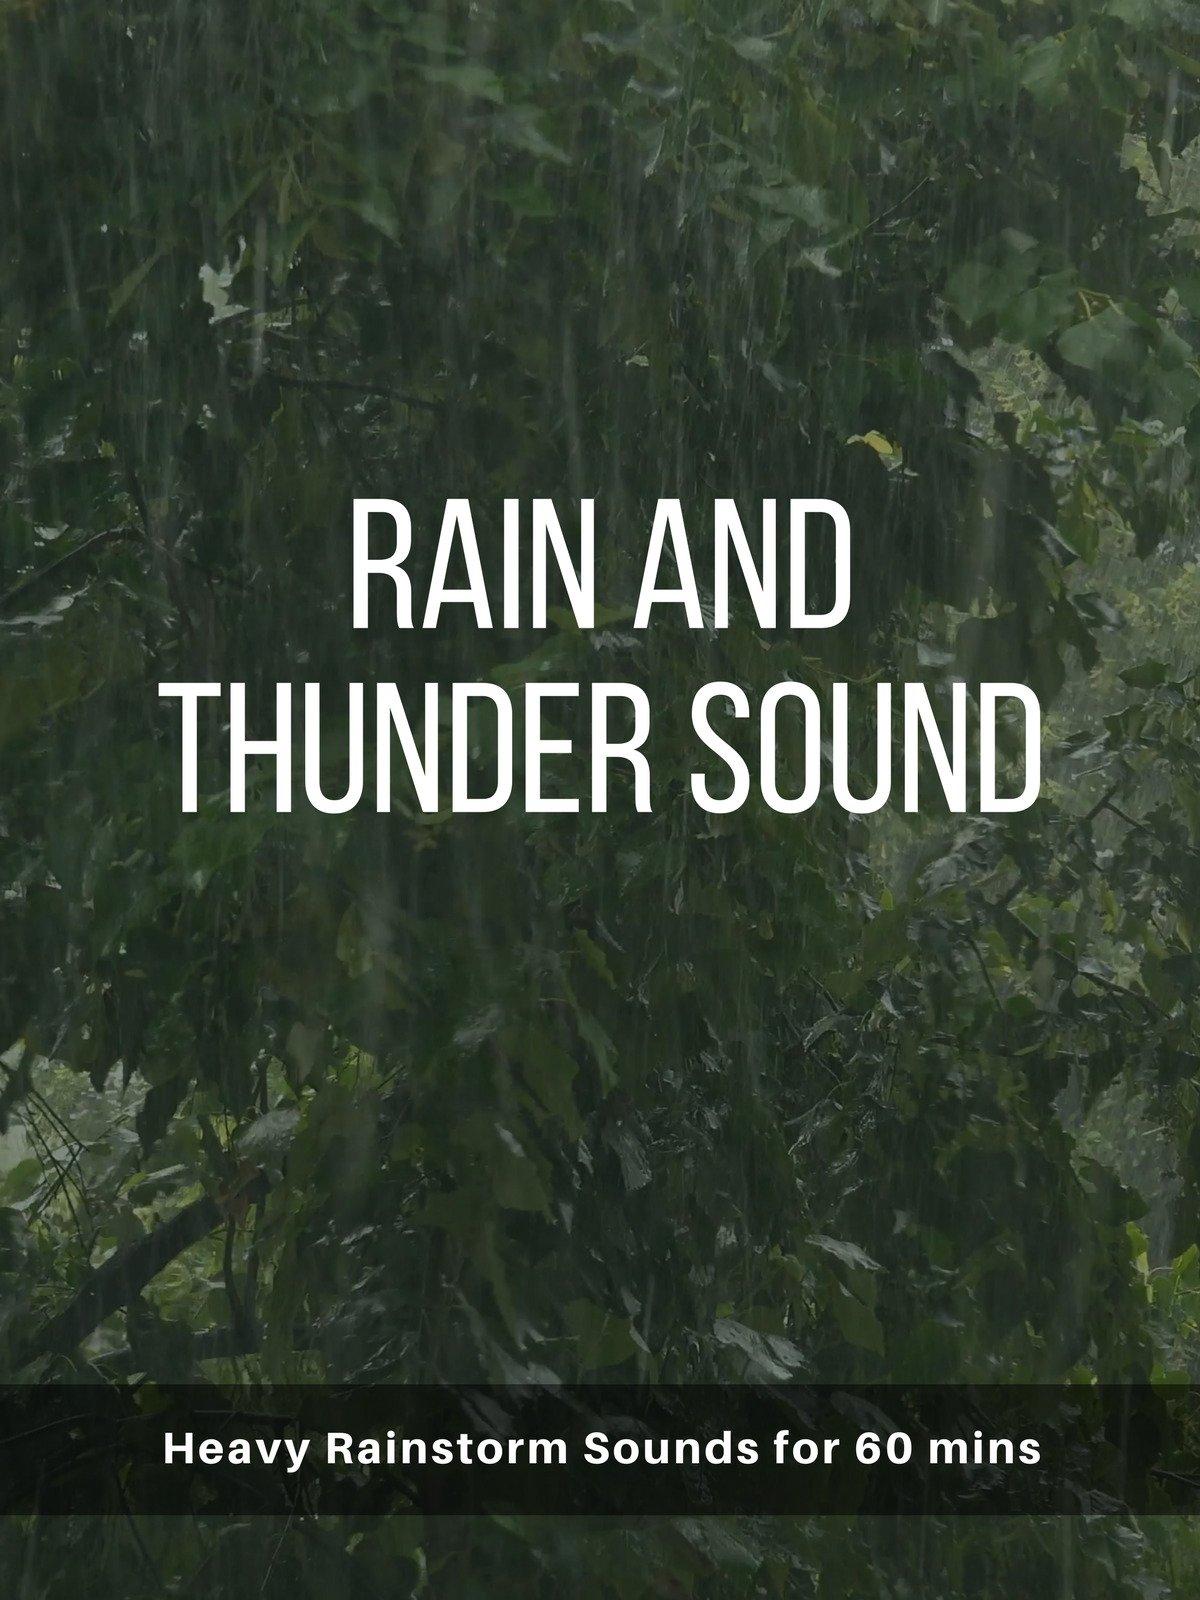 Rain and Thunder Sound